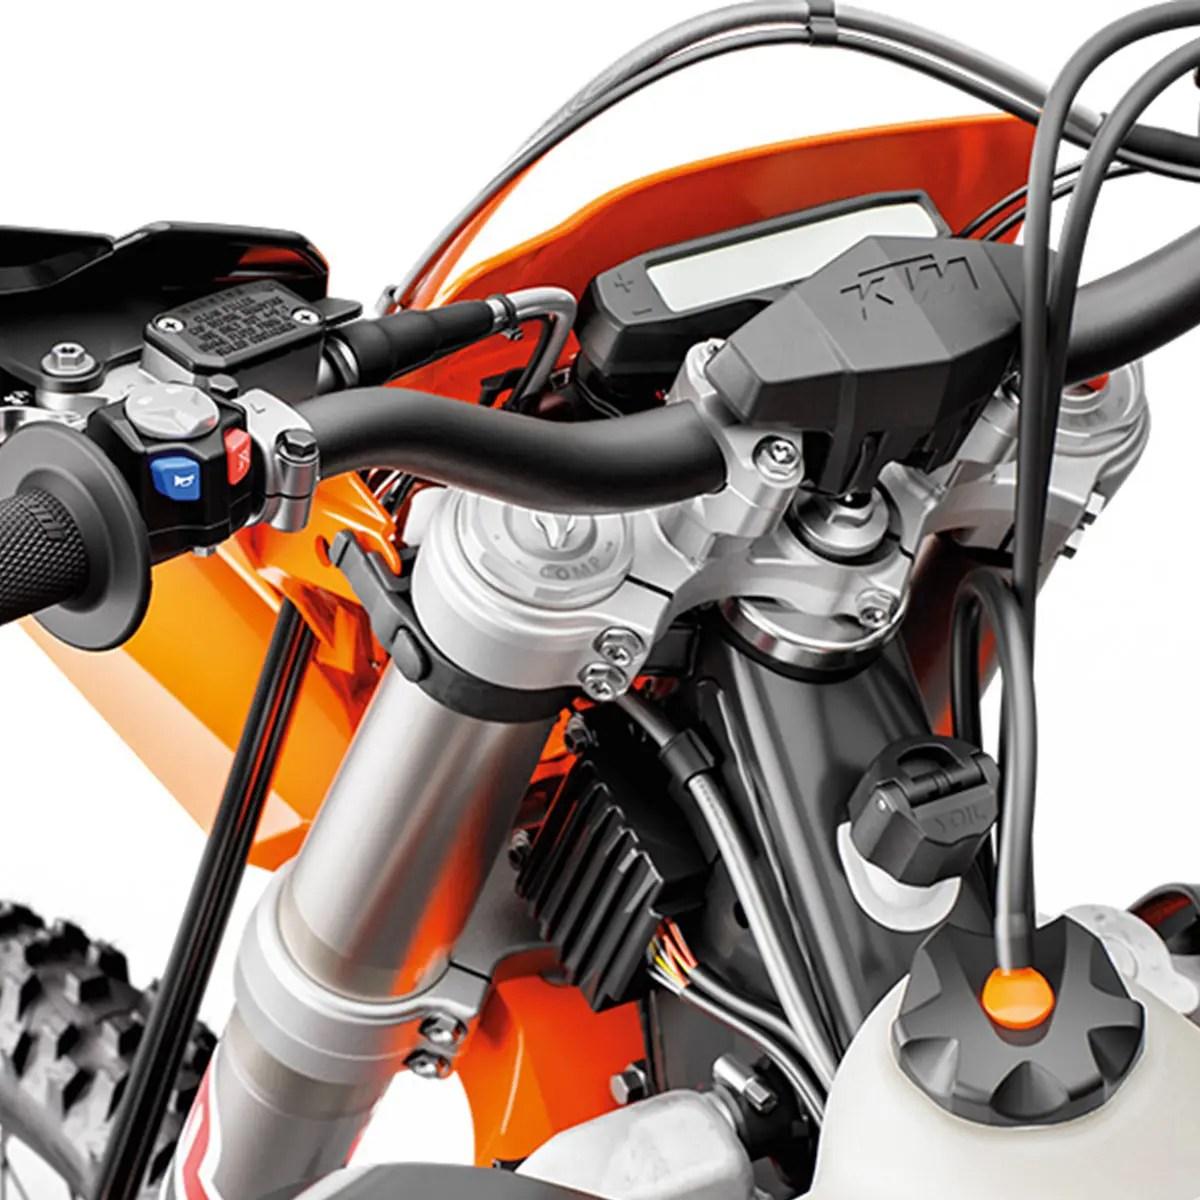 GUIDON-500-EXC-F-KTM